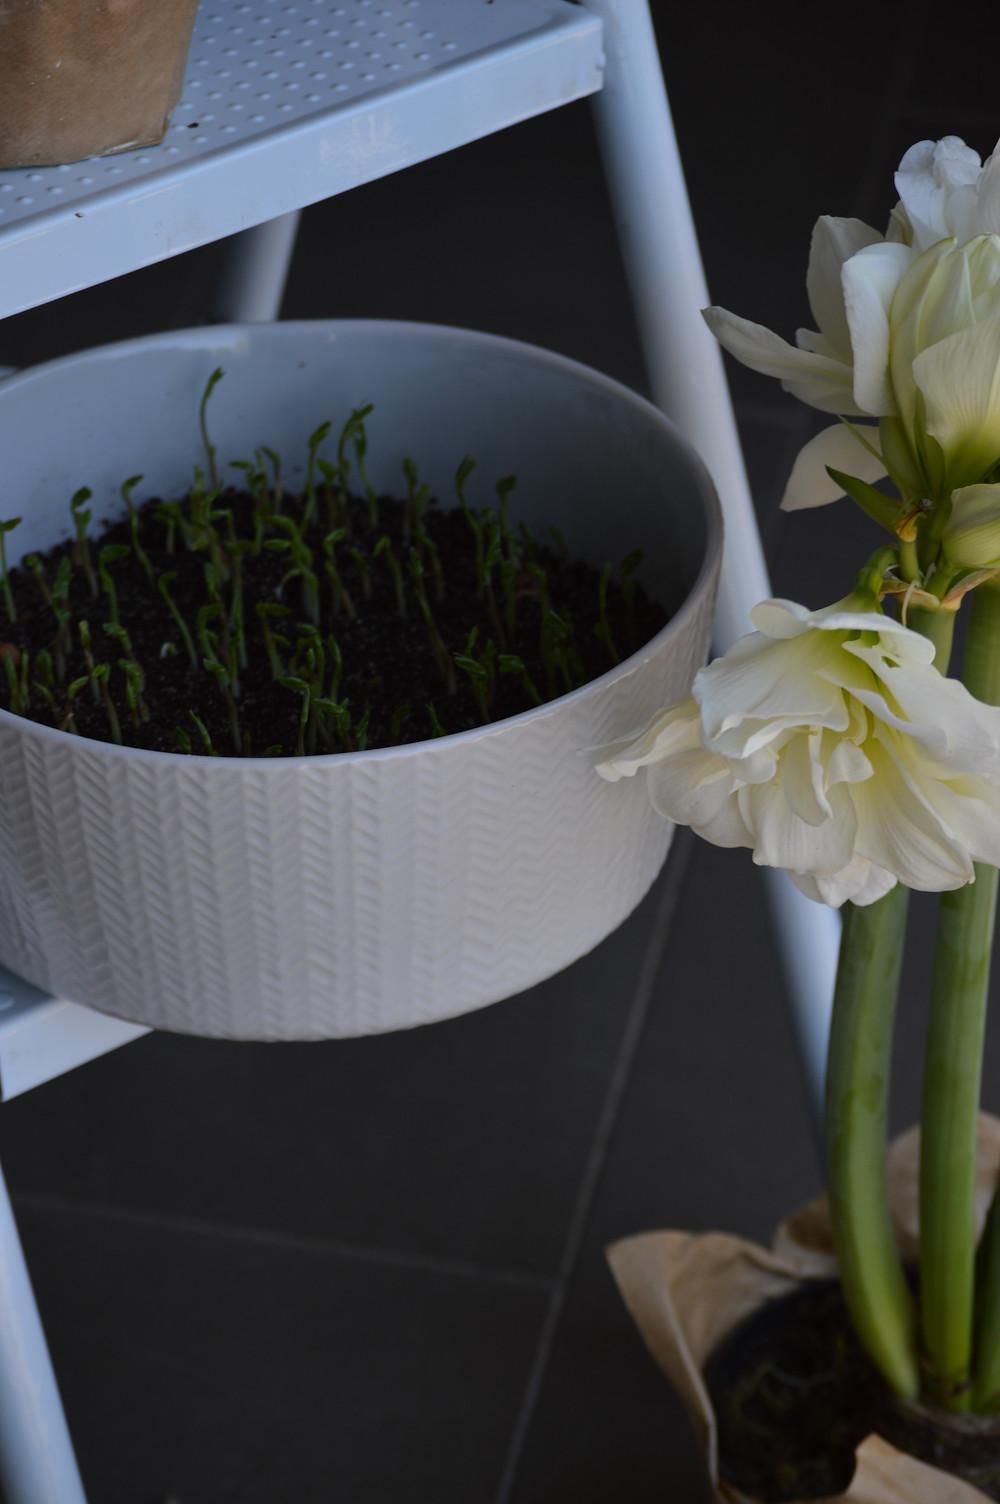 Microgreens, Pea shoots, Peas food photography, organic gardening, sustainable farming